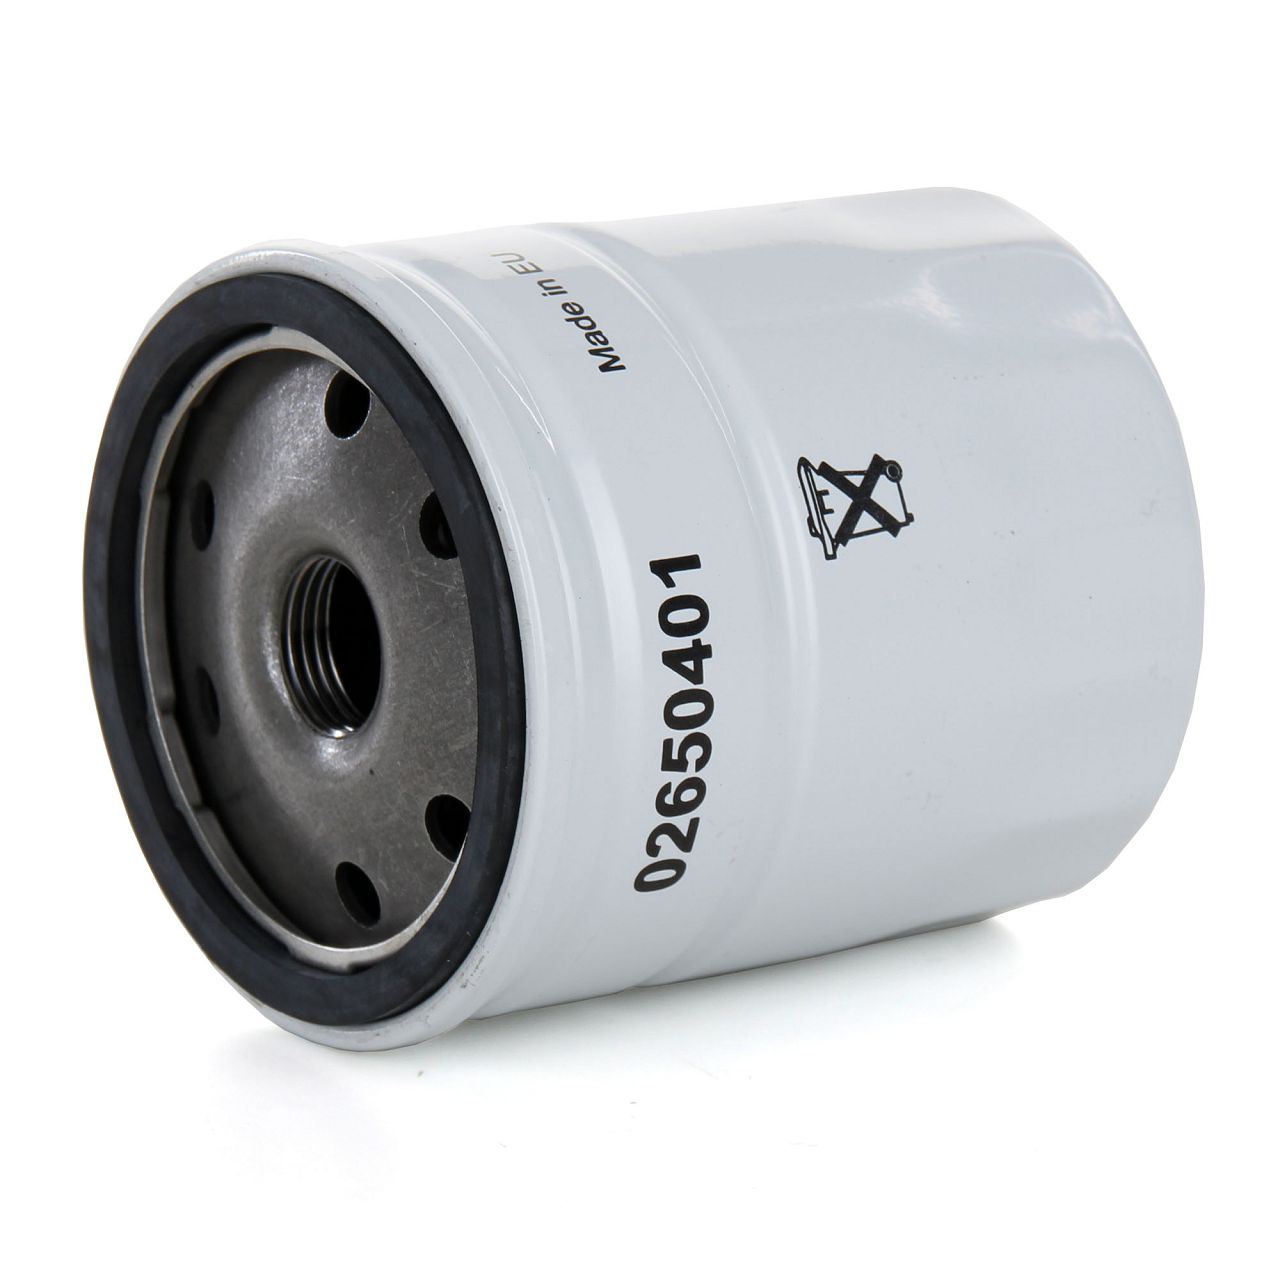 Filterpaket Filterset für Opel Combo Corsa B Tigra A 1.2-1.6 45-100PS